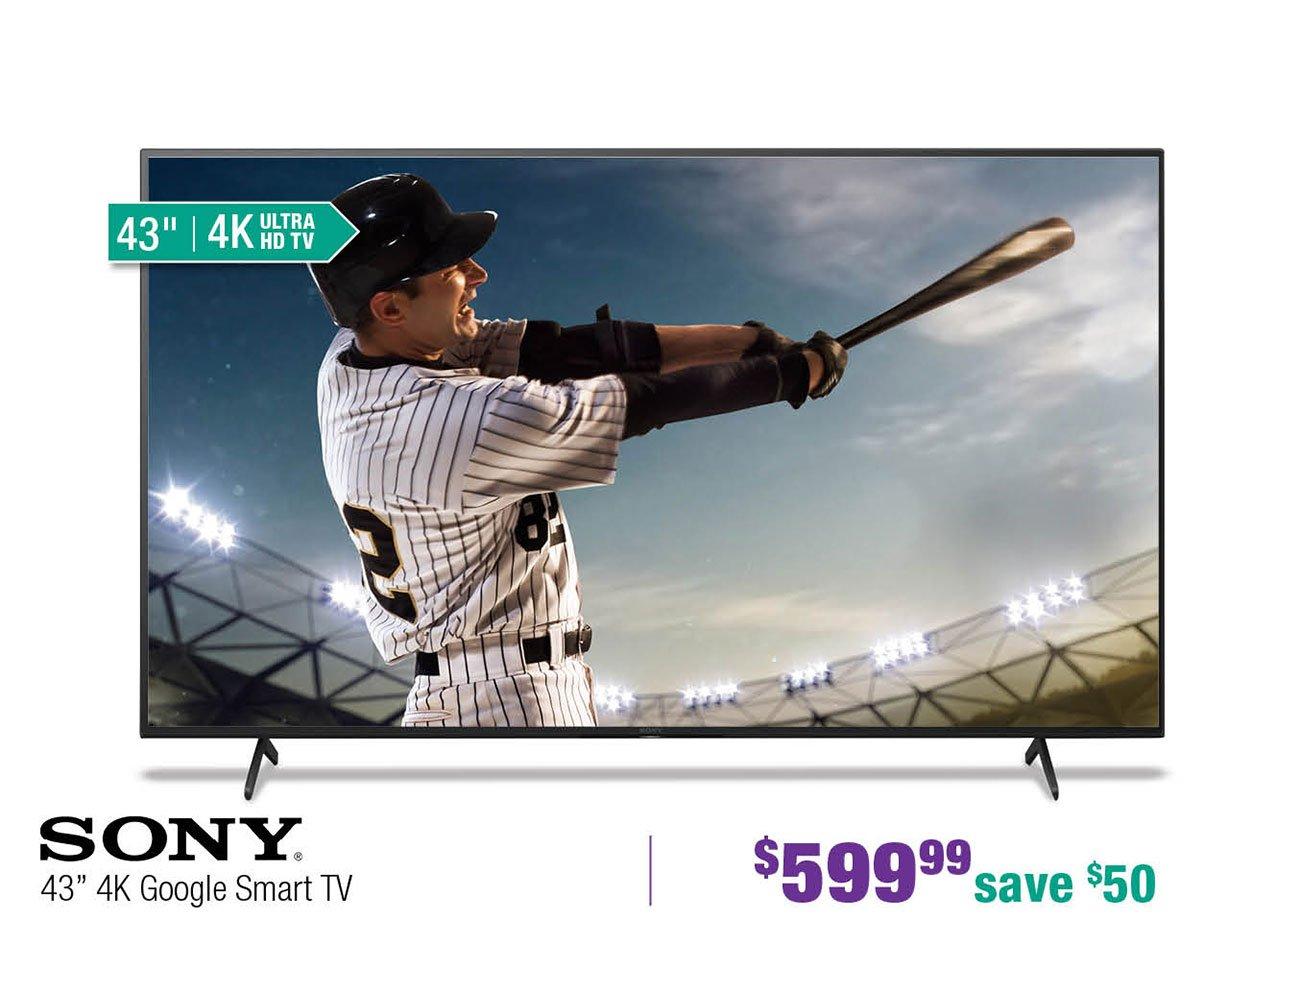 Sony-43-inch-4k-tv